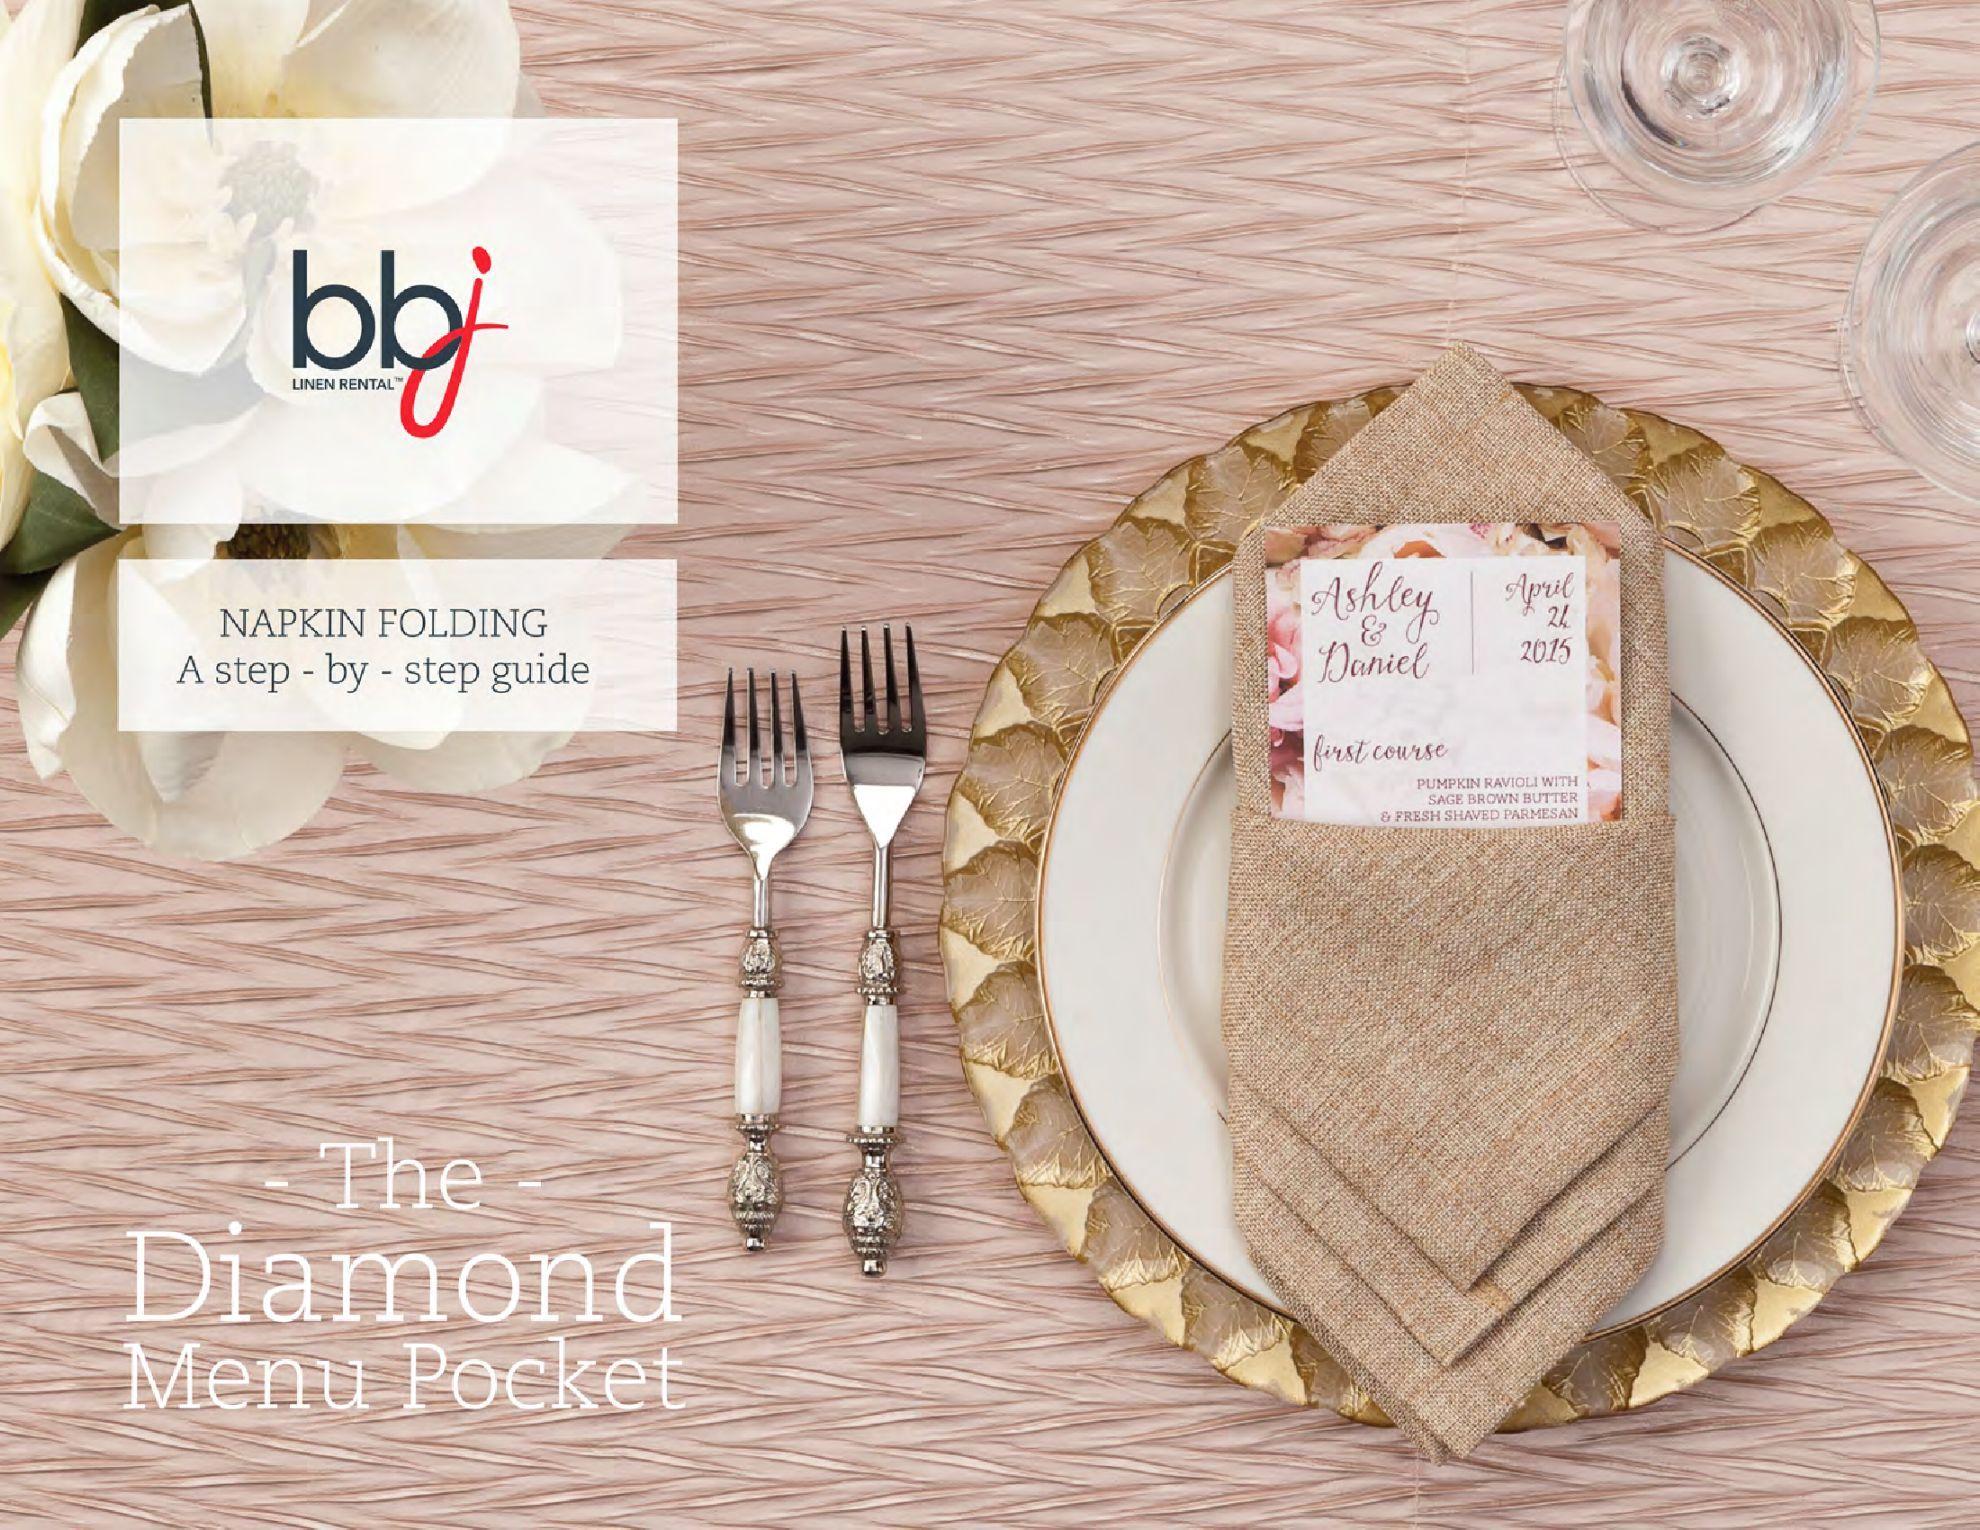 event table linen rental company online linen rentals napkin rh pinterest com table linen rentals near me table linen rentals vaughan